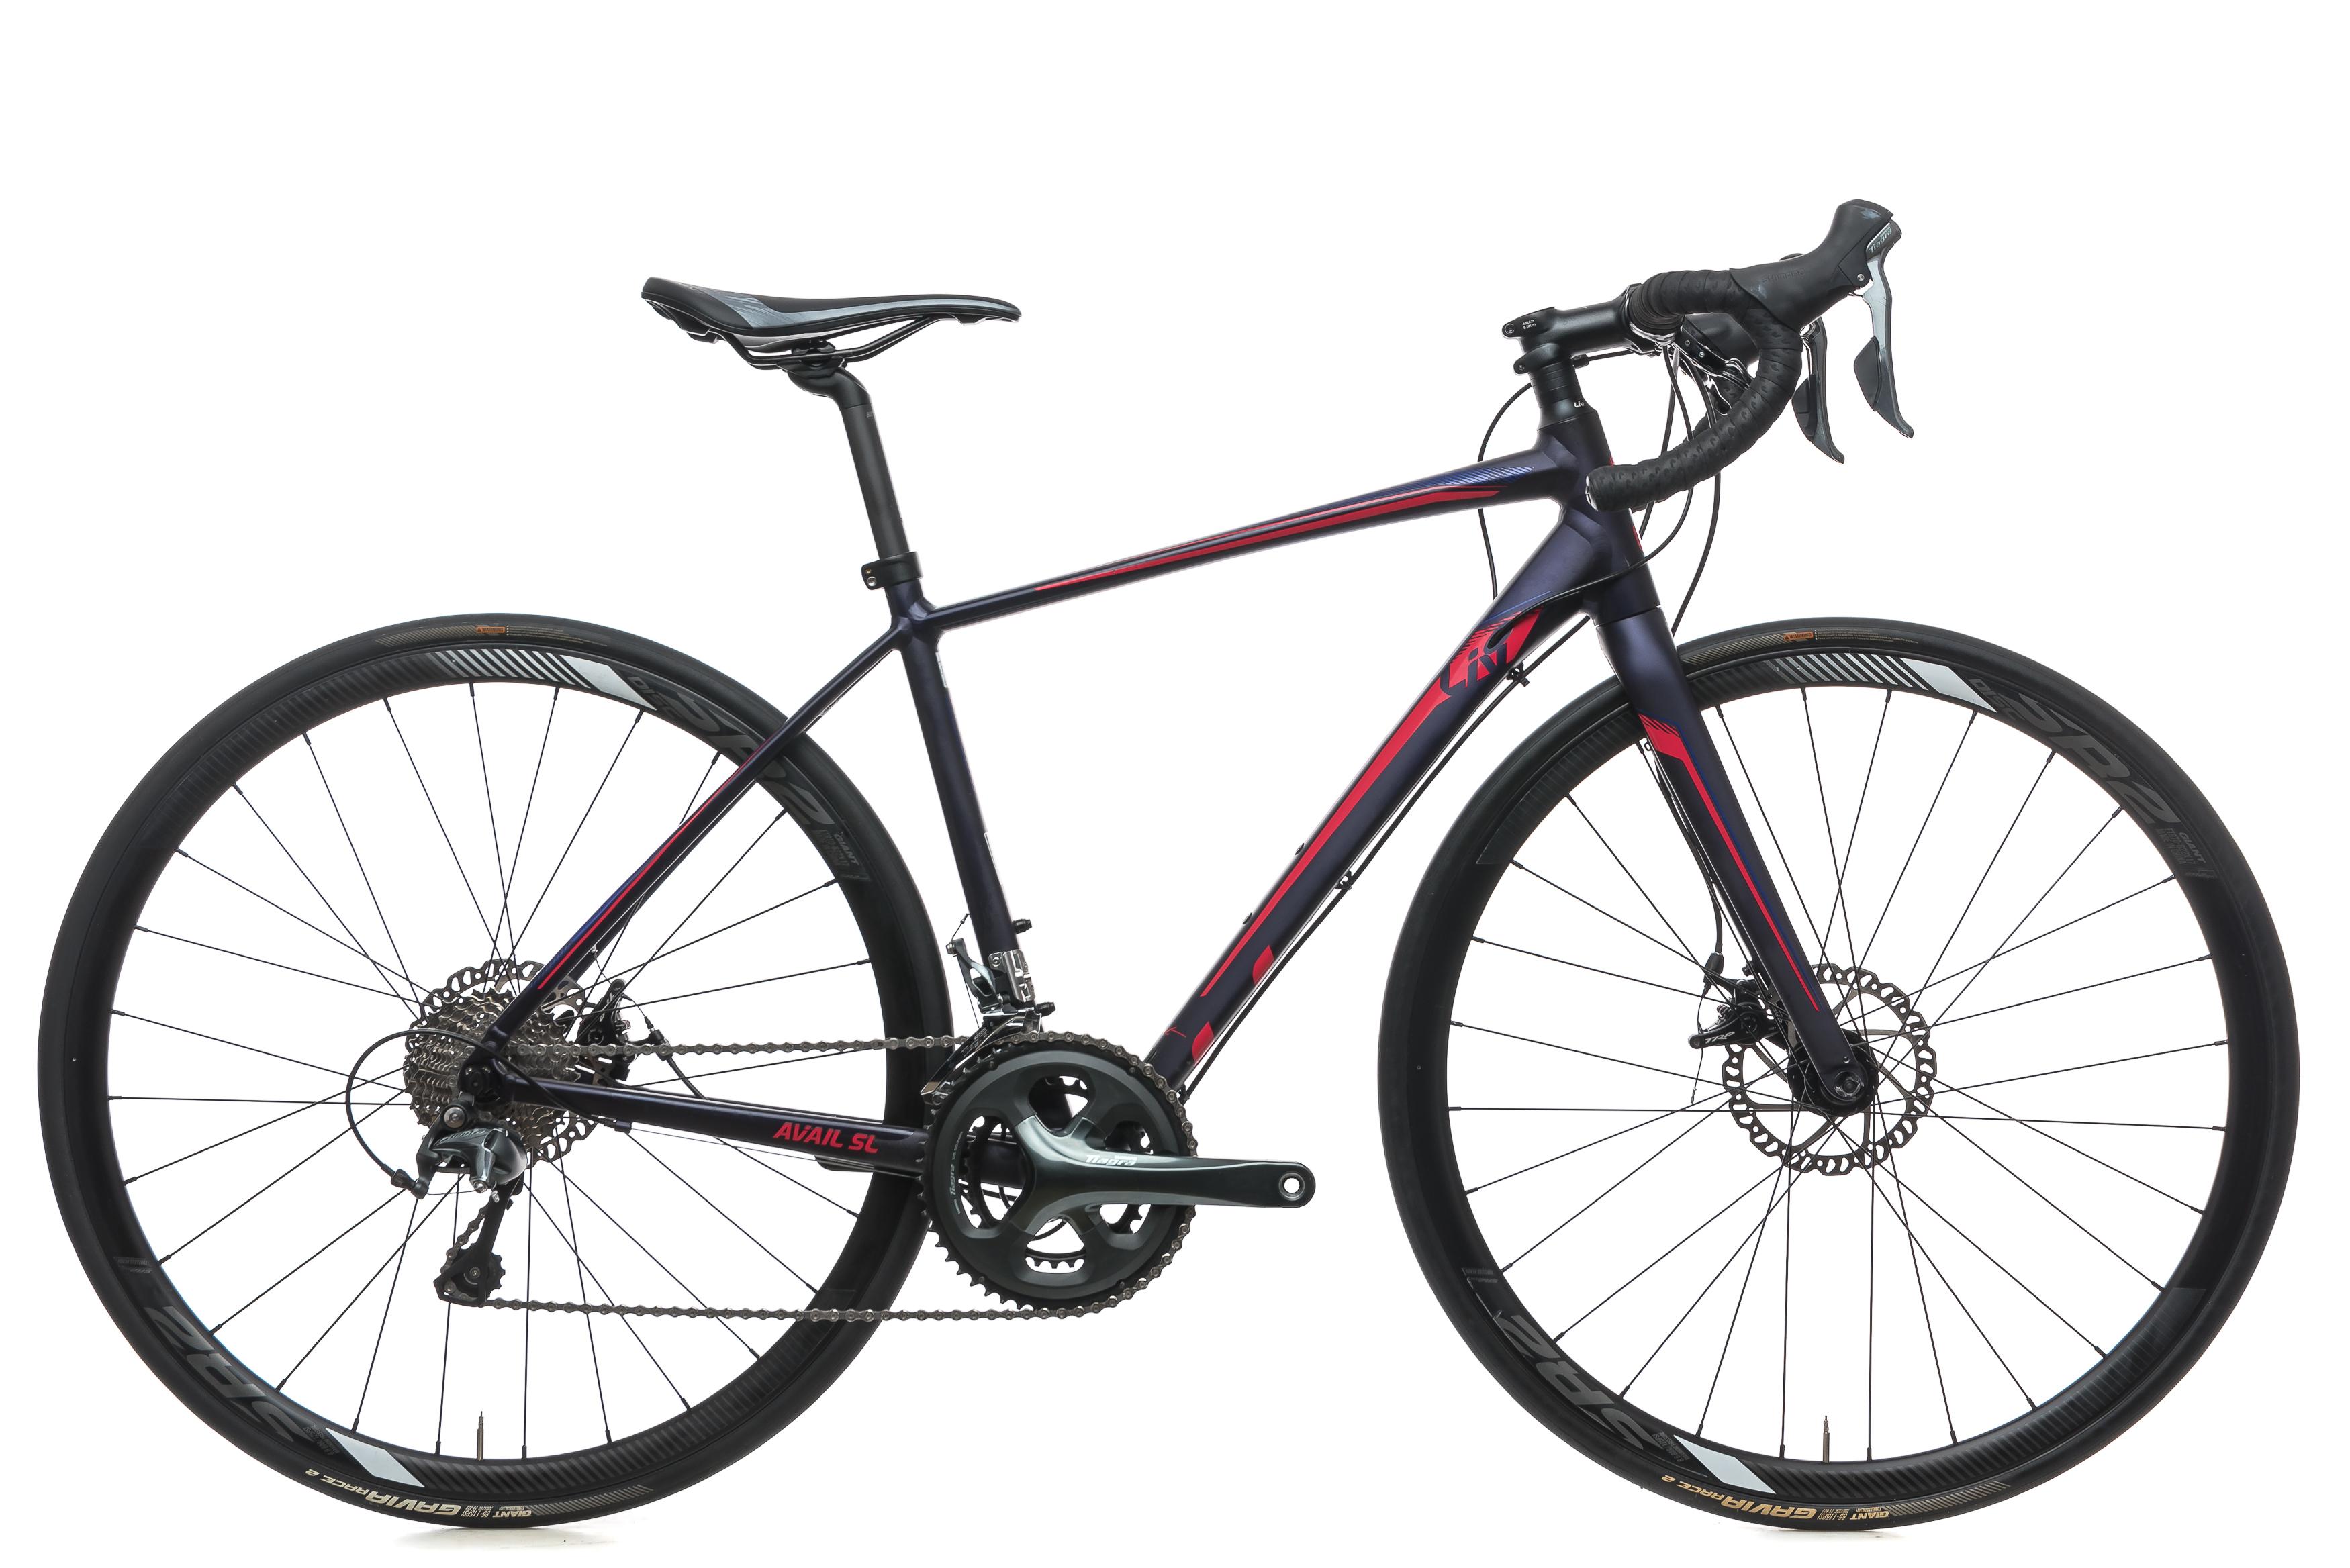 79f246952f3 2018 Liv Avail SL 2 Disc Womens Road Bike Small Aluminum Shimano Tiagra  2x10 TRP